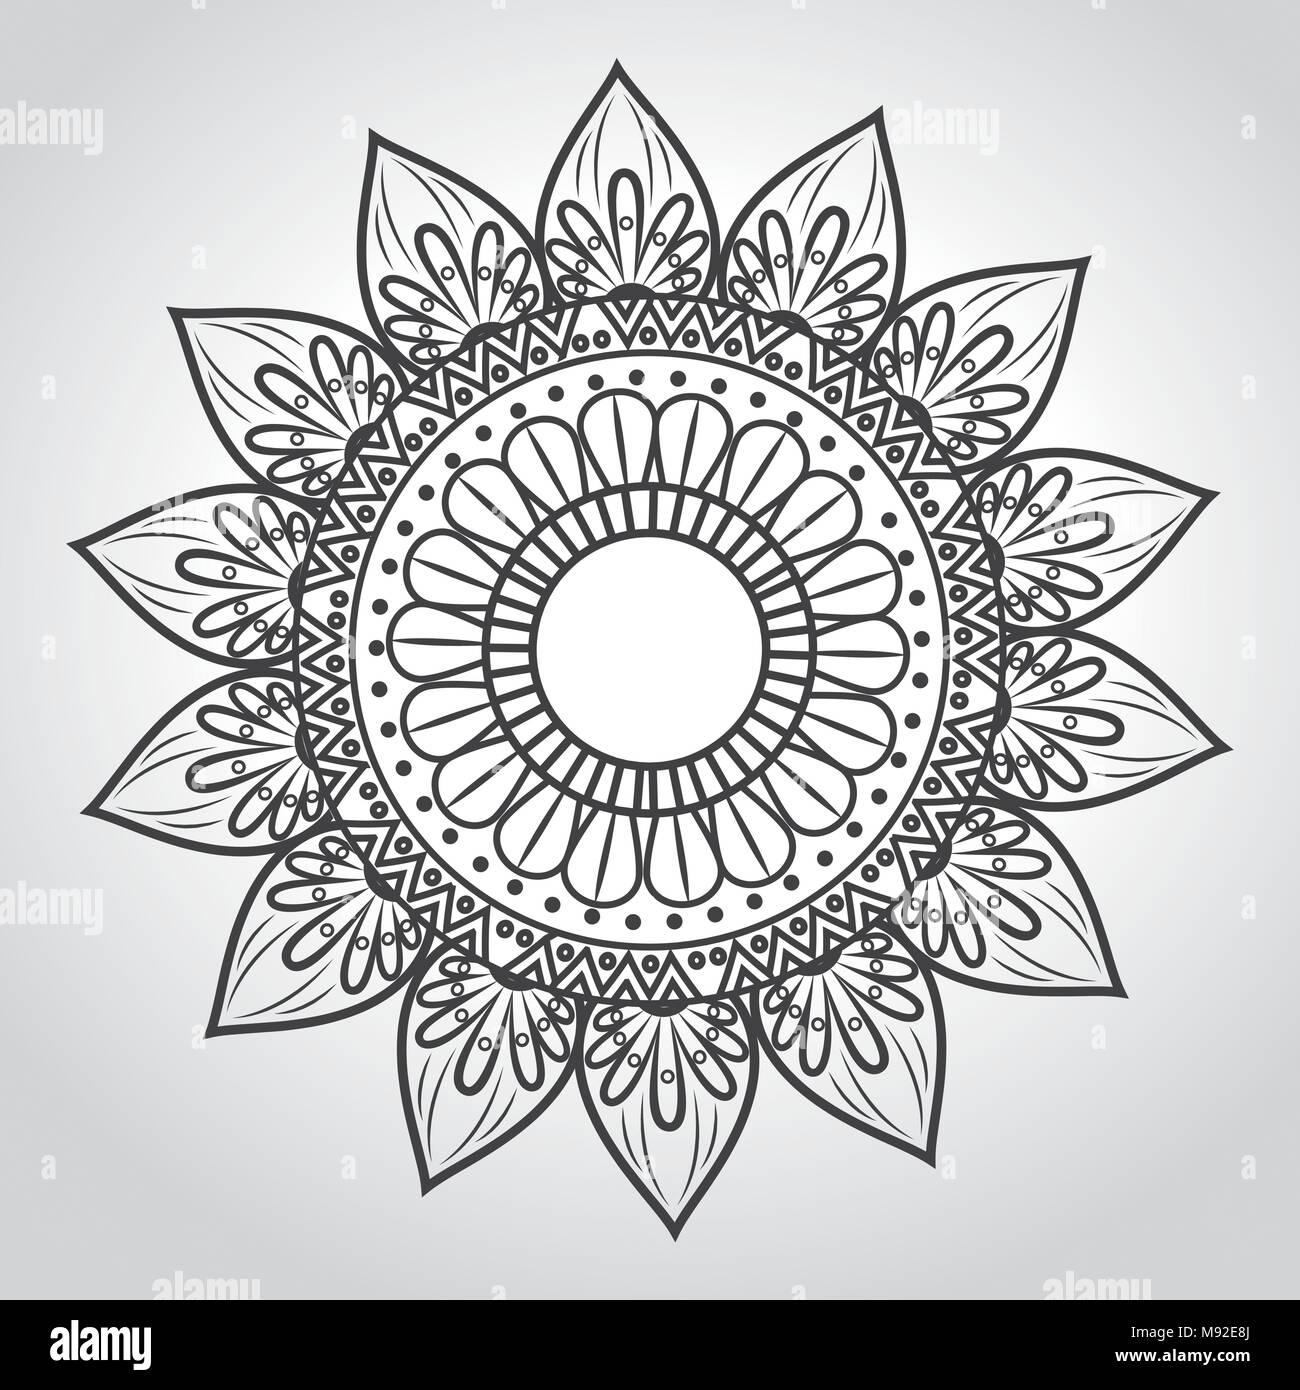 bohemian background design stock vector image art alamy https www alamy com bohemian background design image177690706 html